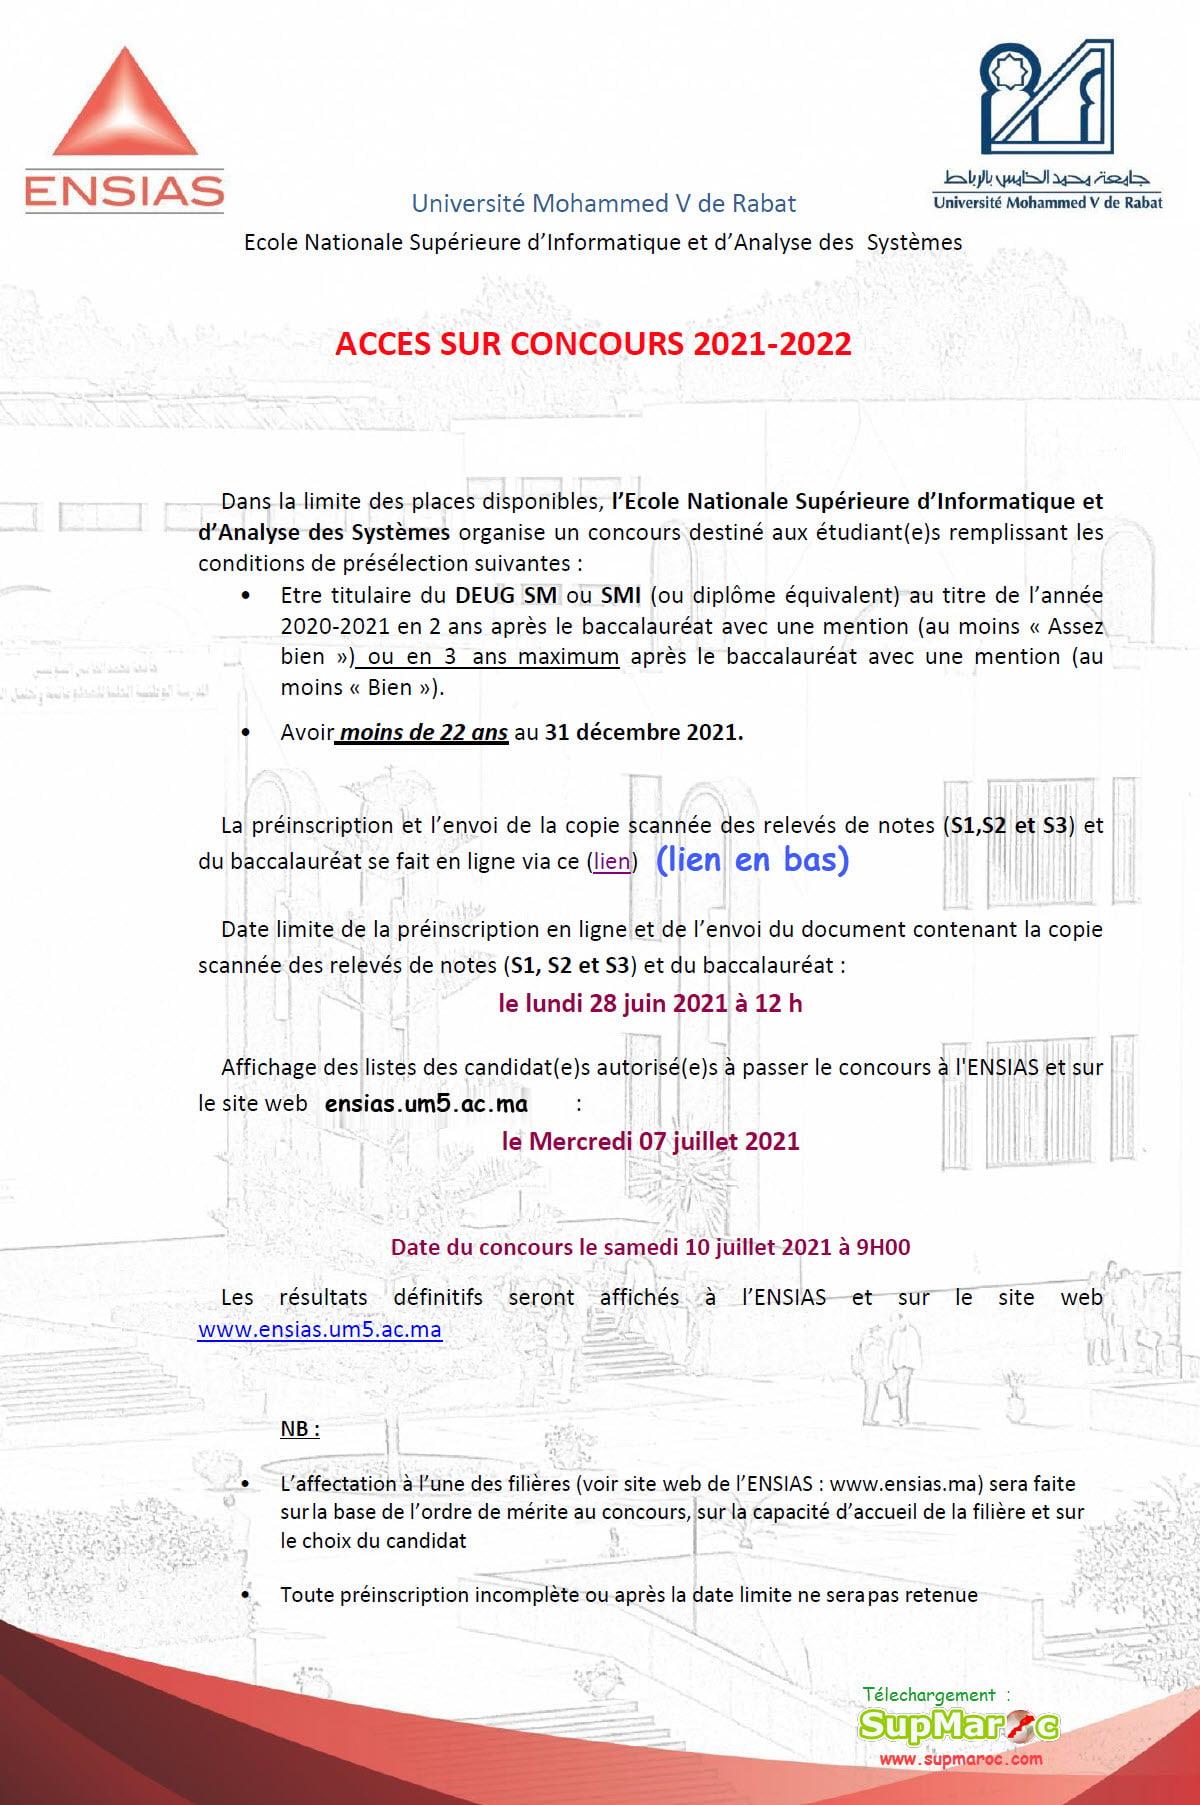 Concours sur Concours ENSIAS DEUG Rabat 2021 2022